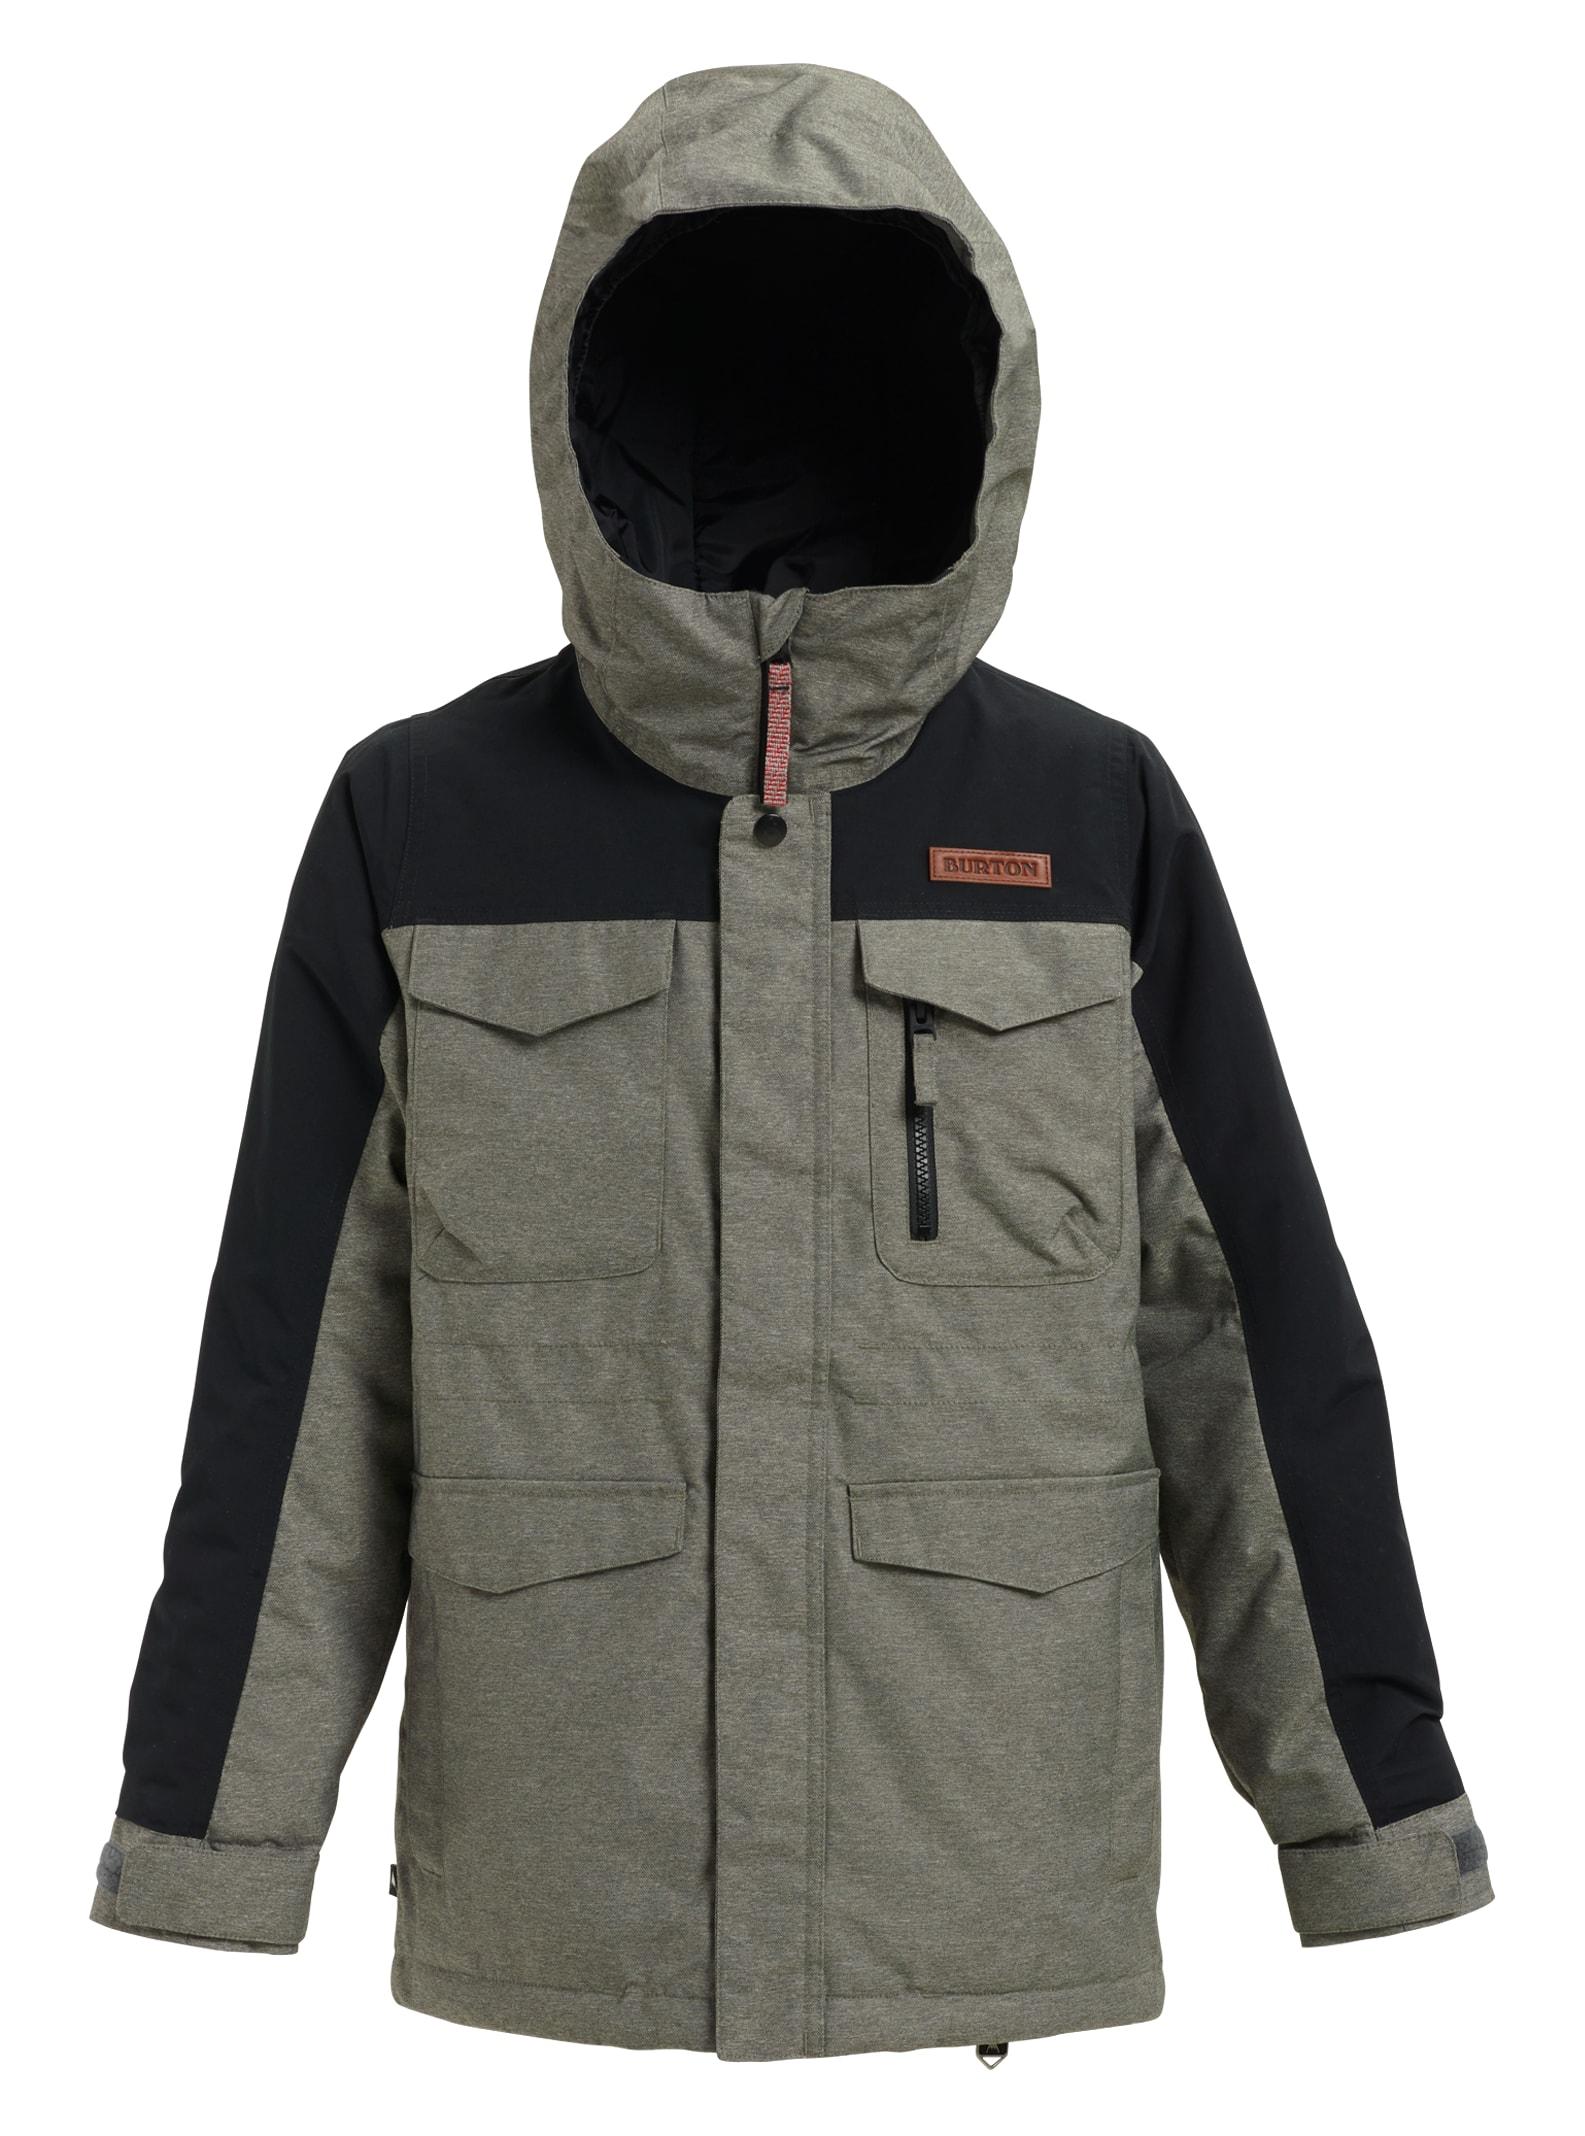 Kids  Snowboard Jackets  b6096ac4eec17